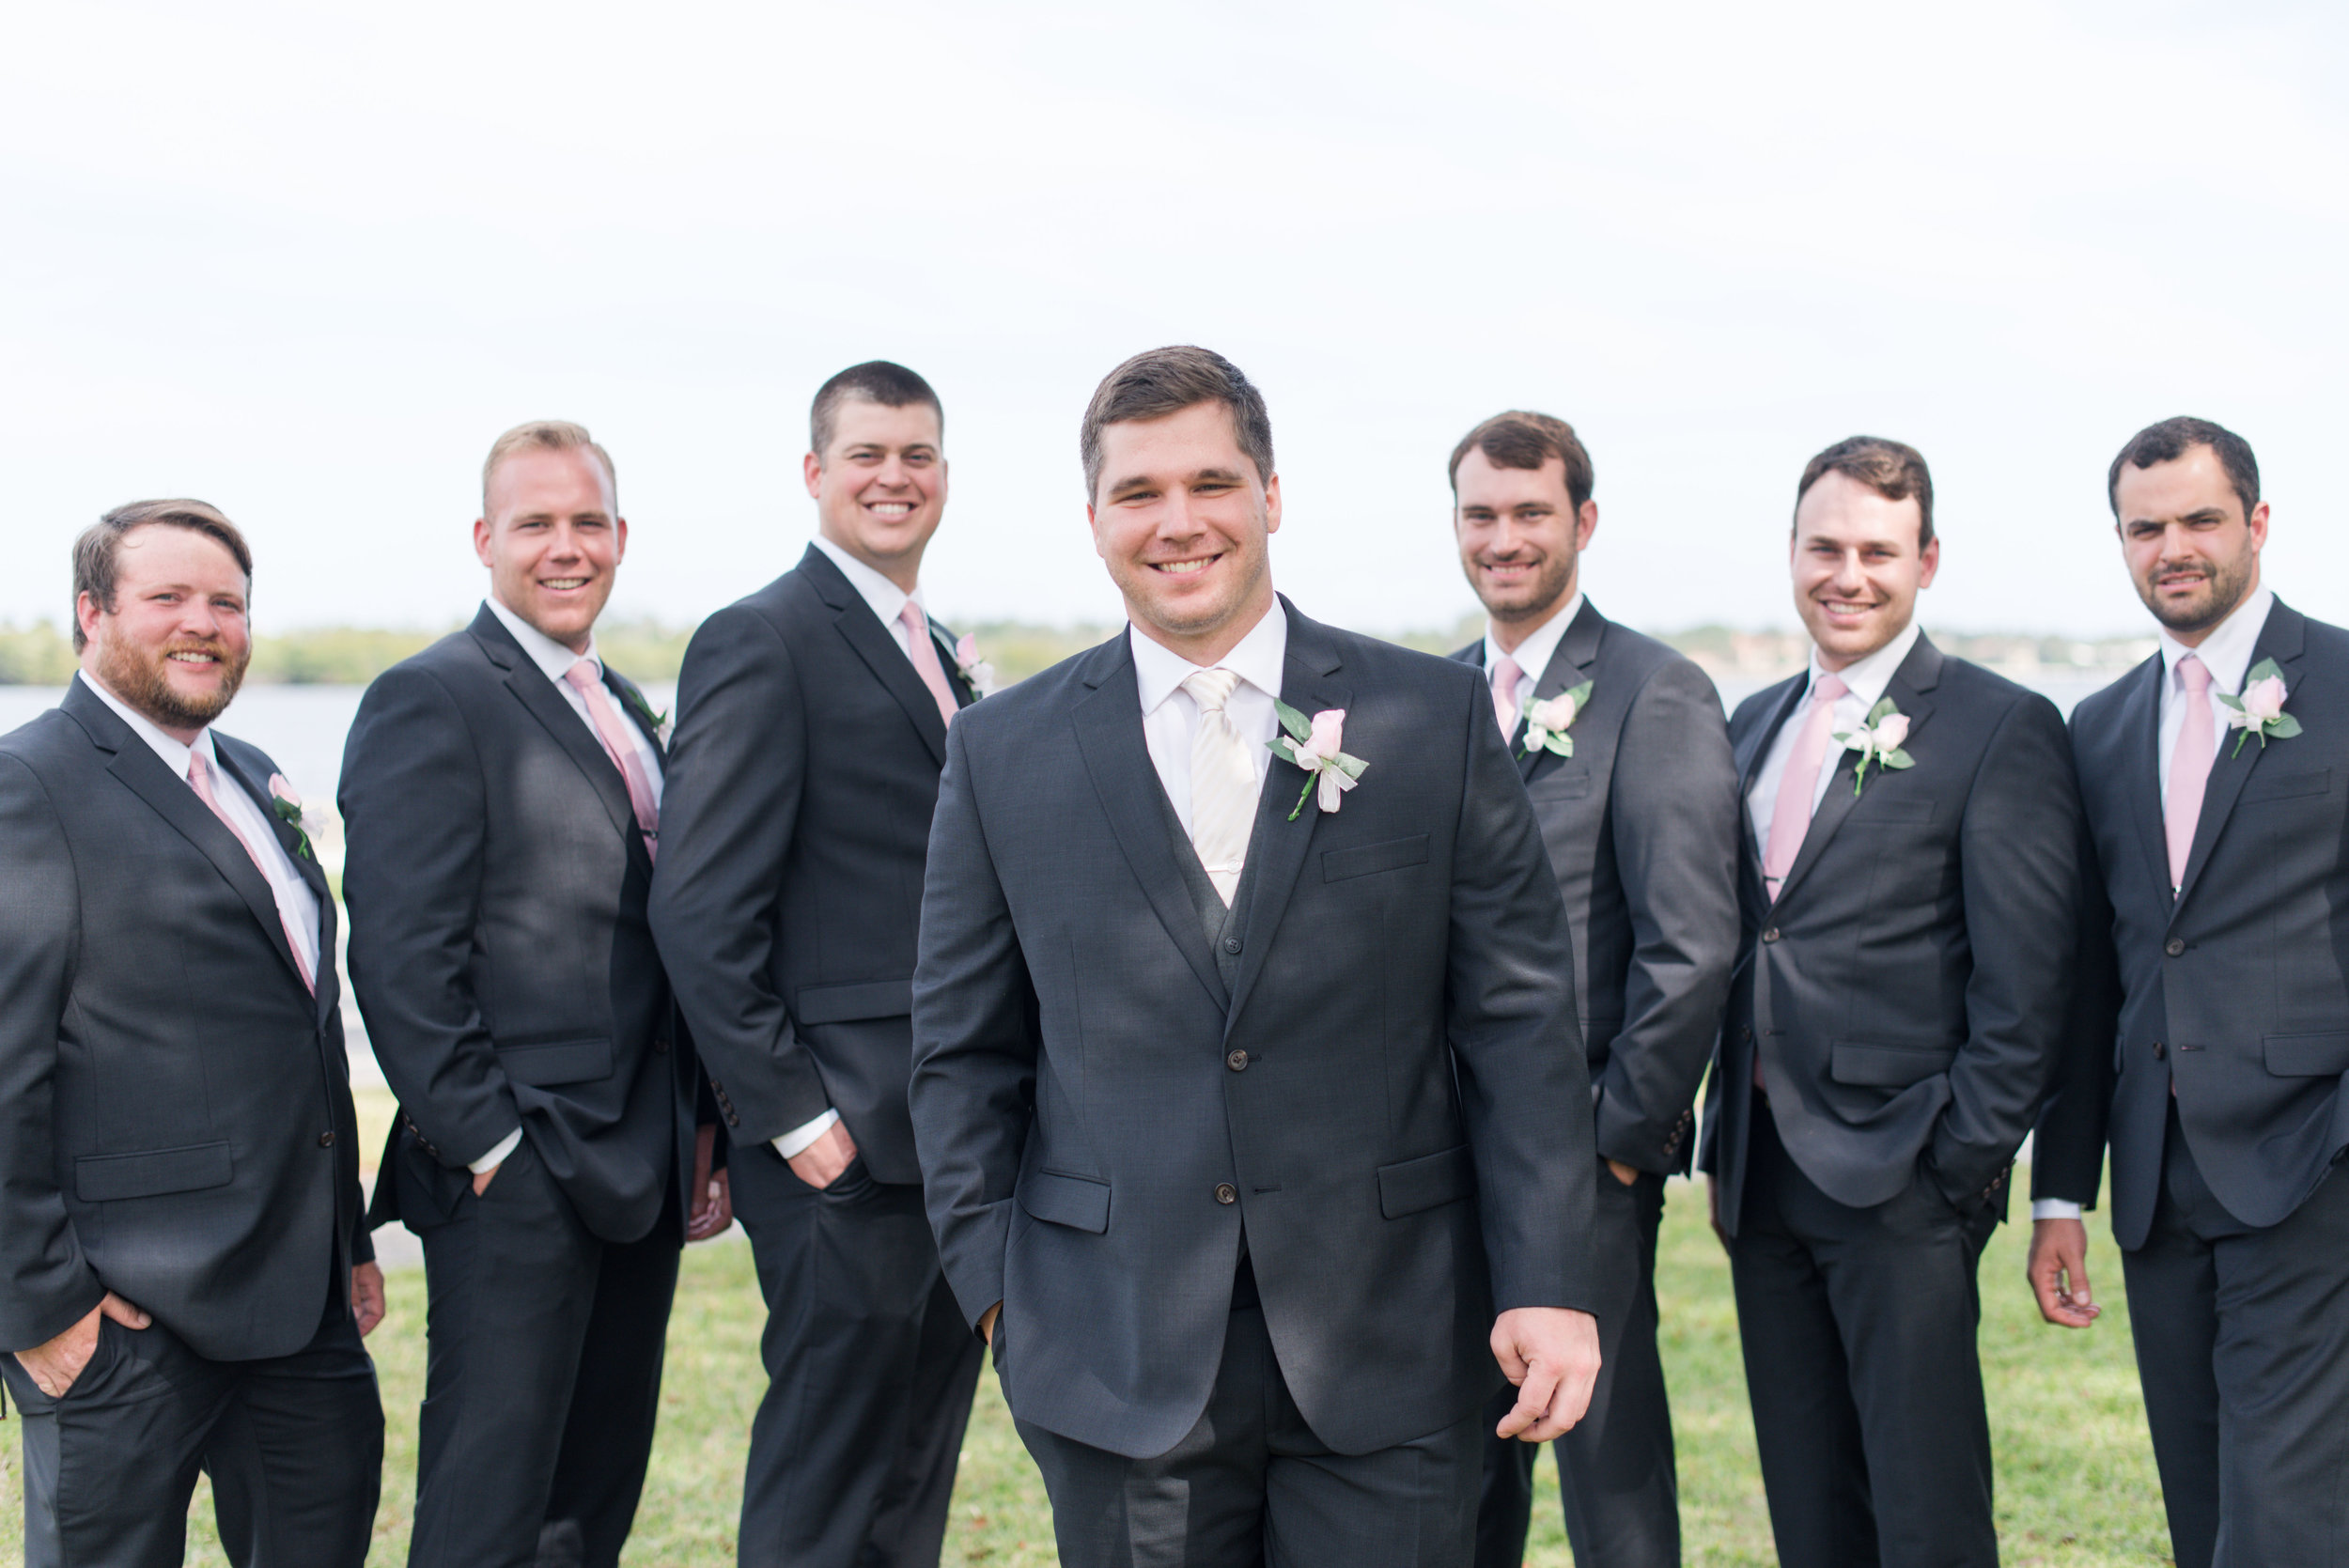 2019_04_06_Hart_Wedding_CMageePhotography_5.jpg